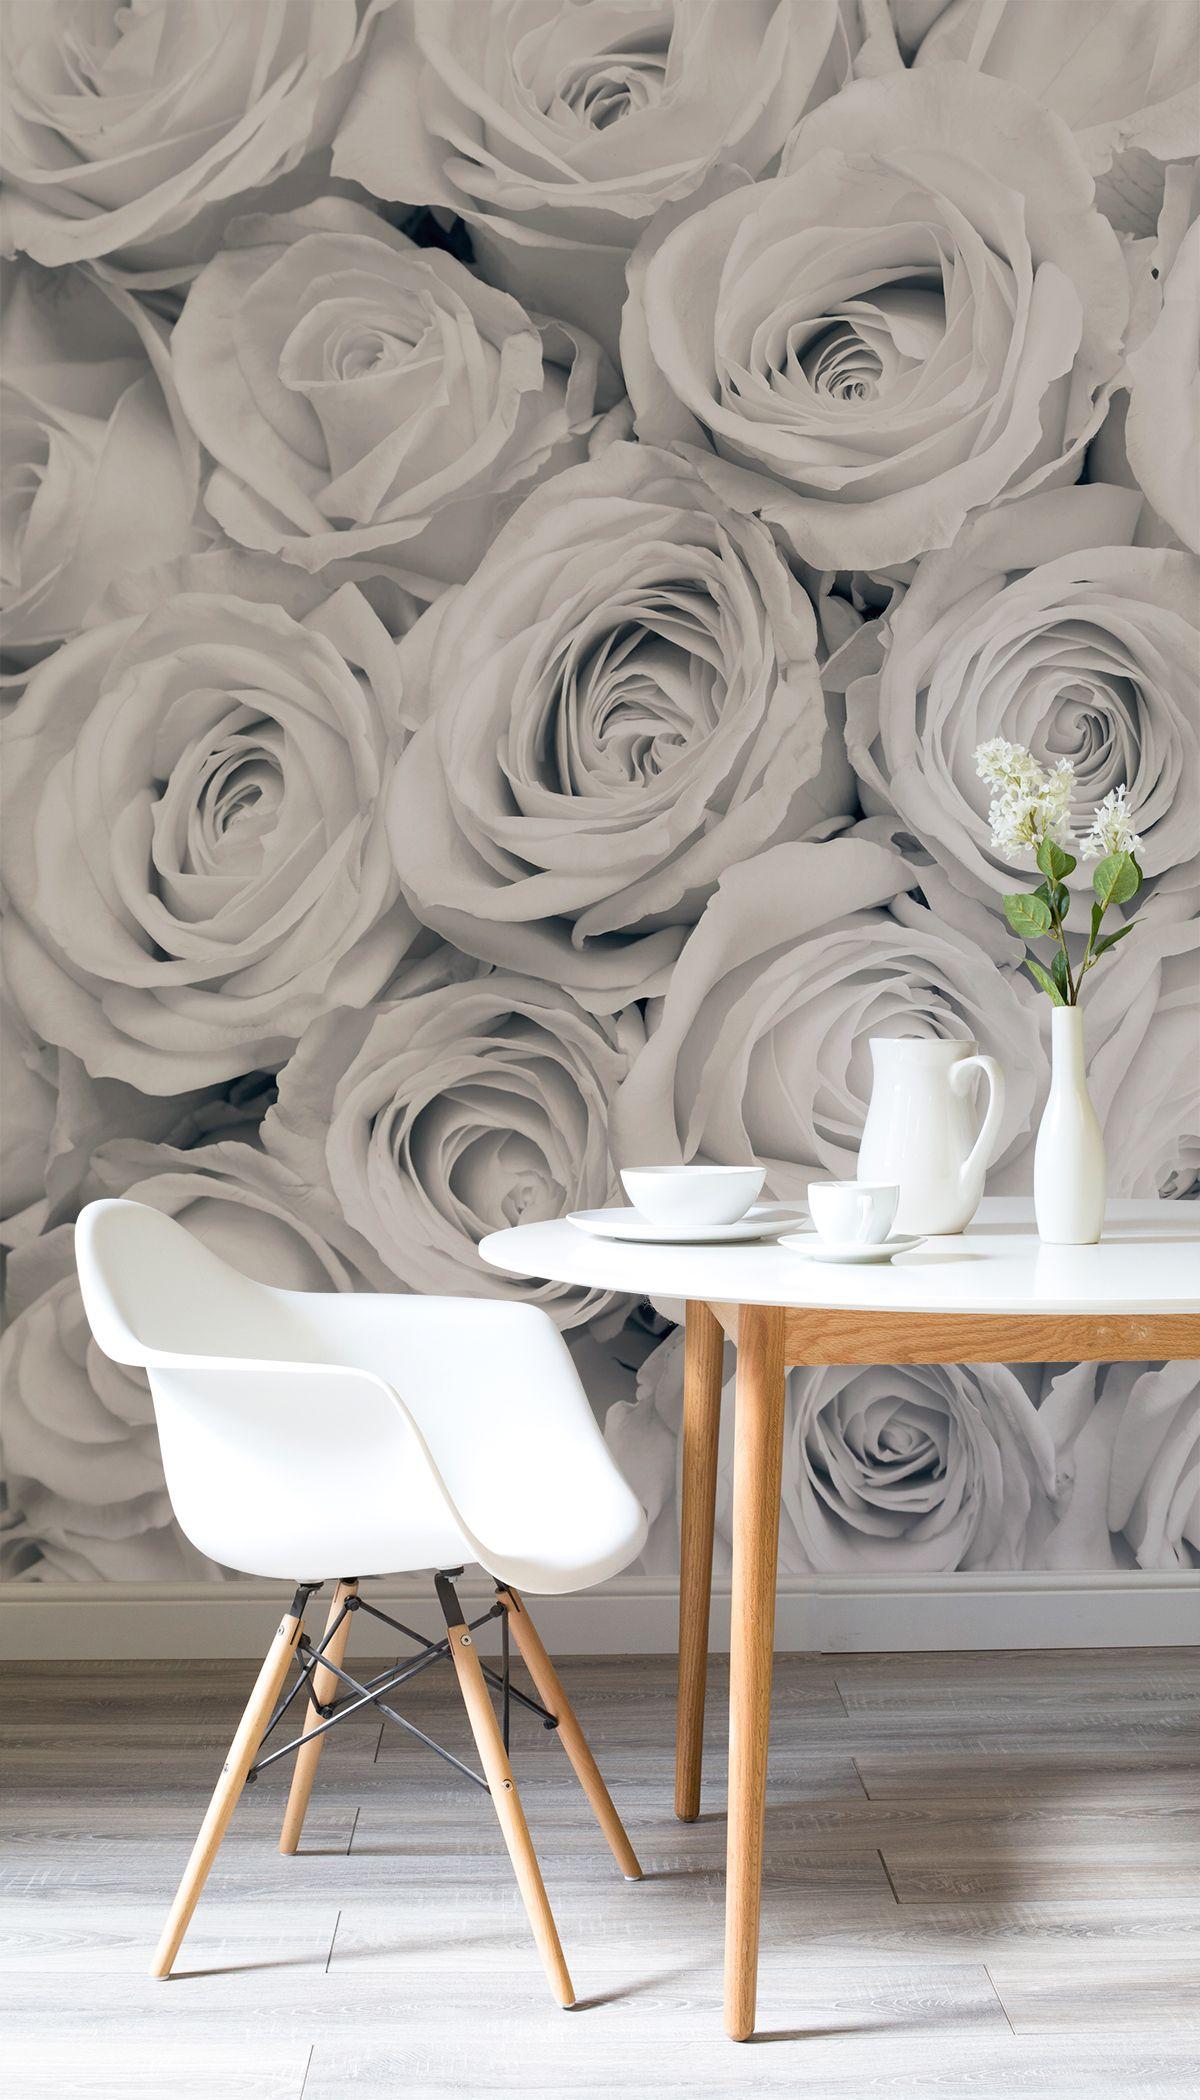 Rose Mist Wallpaper Mural in Millbrooks Home is my Castle